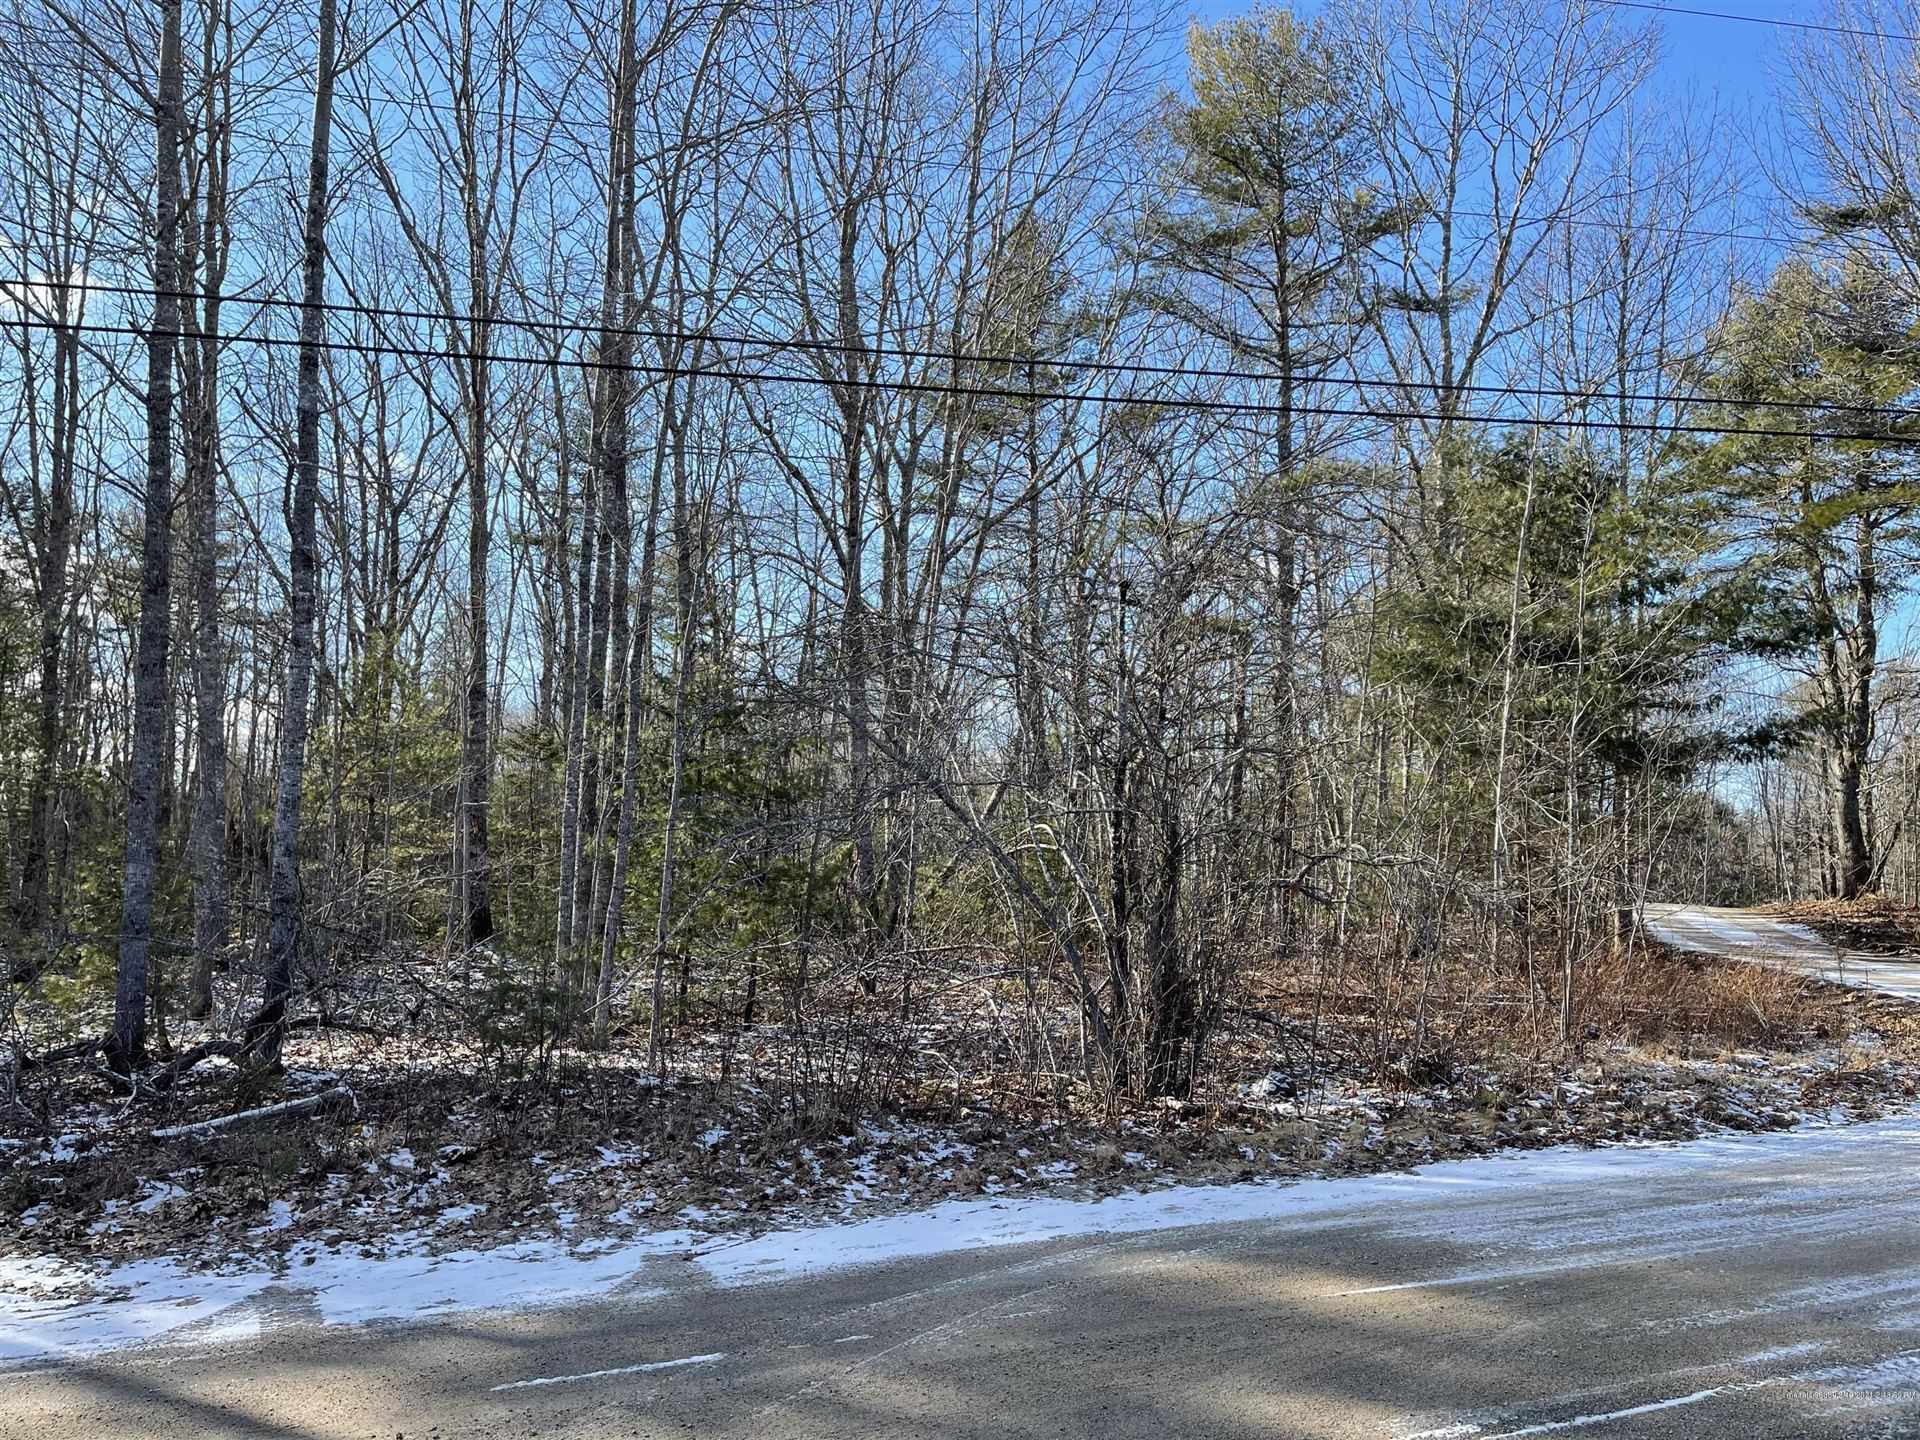 Photo of 50 Whalen Road, Sullivan, ME 04664 (MLS # 1480602)